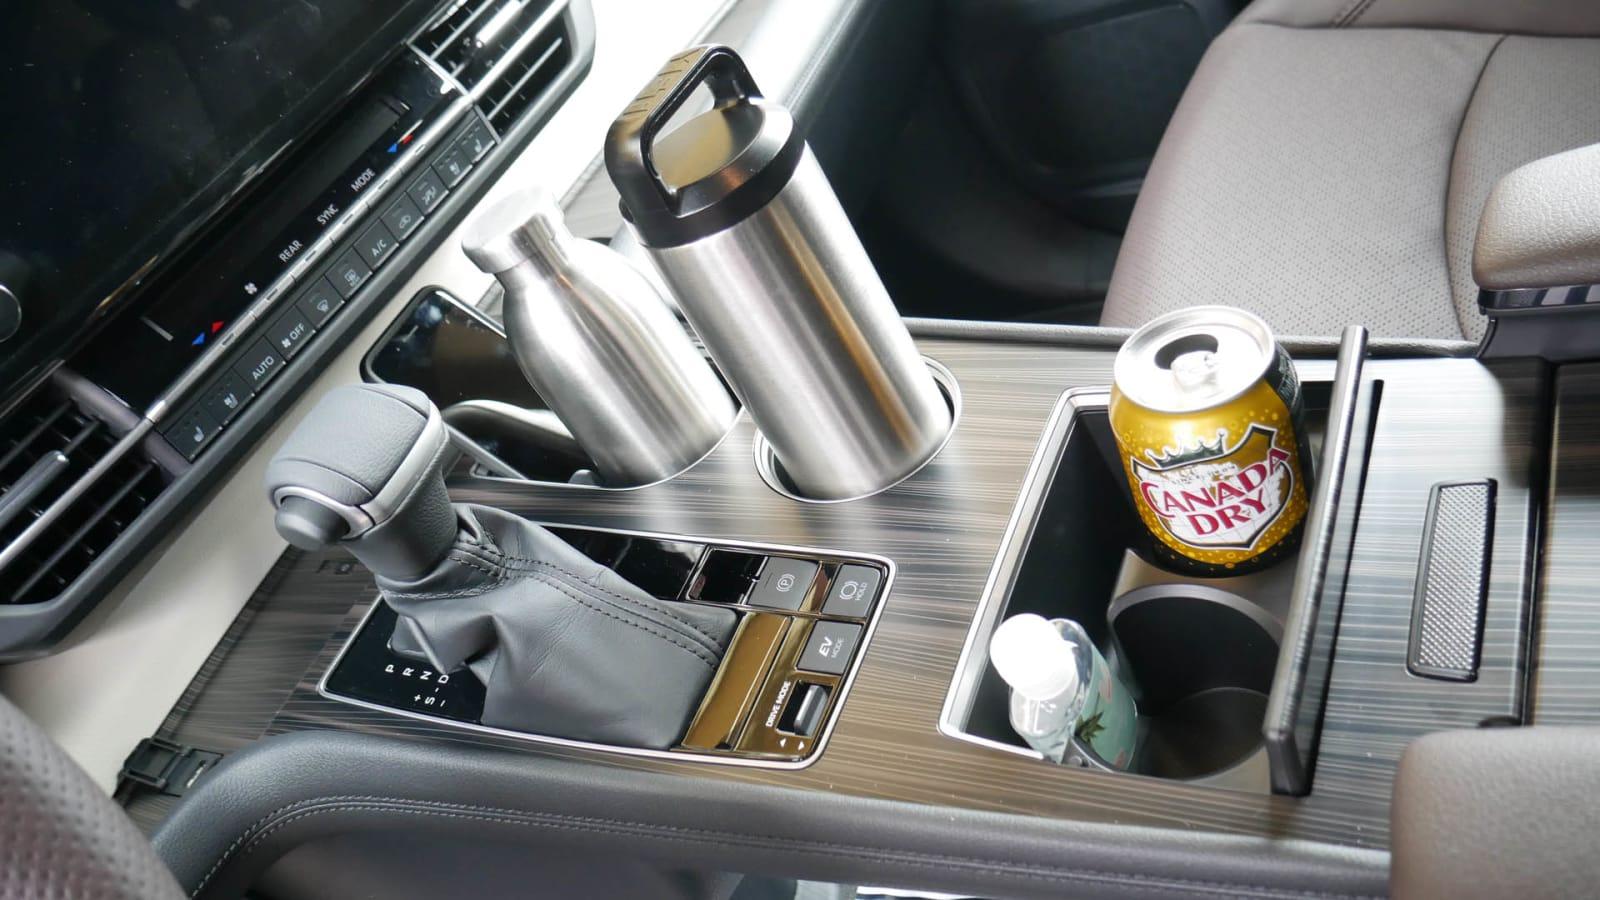 2021 Toyota Sienna interior storage center console loaded